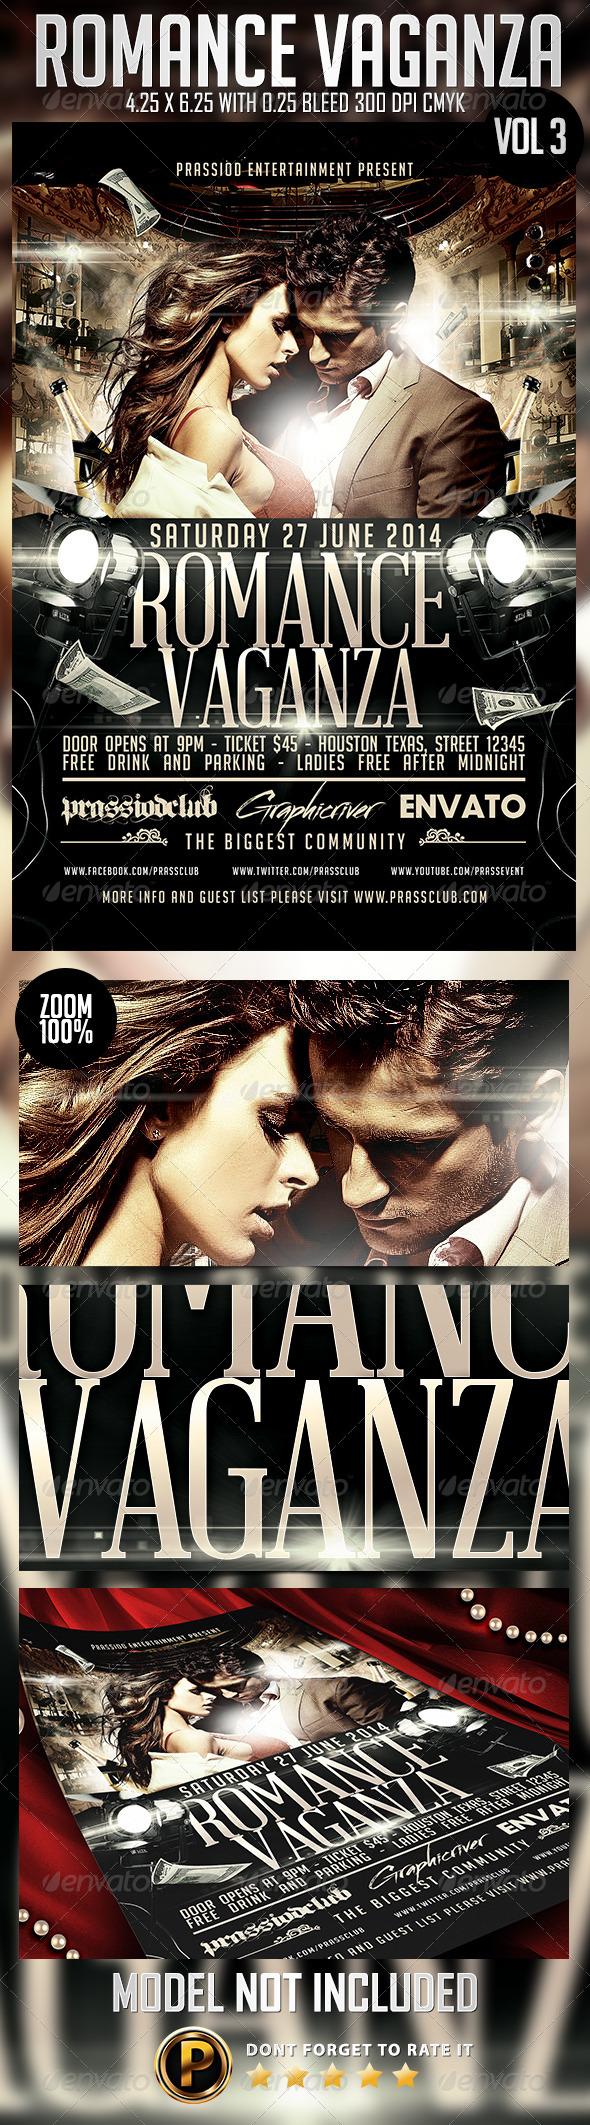 Romance Vaganza Flyer Template Vol 3 - Clubs & Parties Events